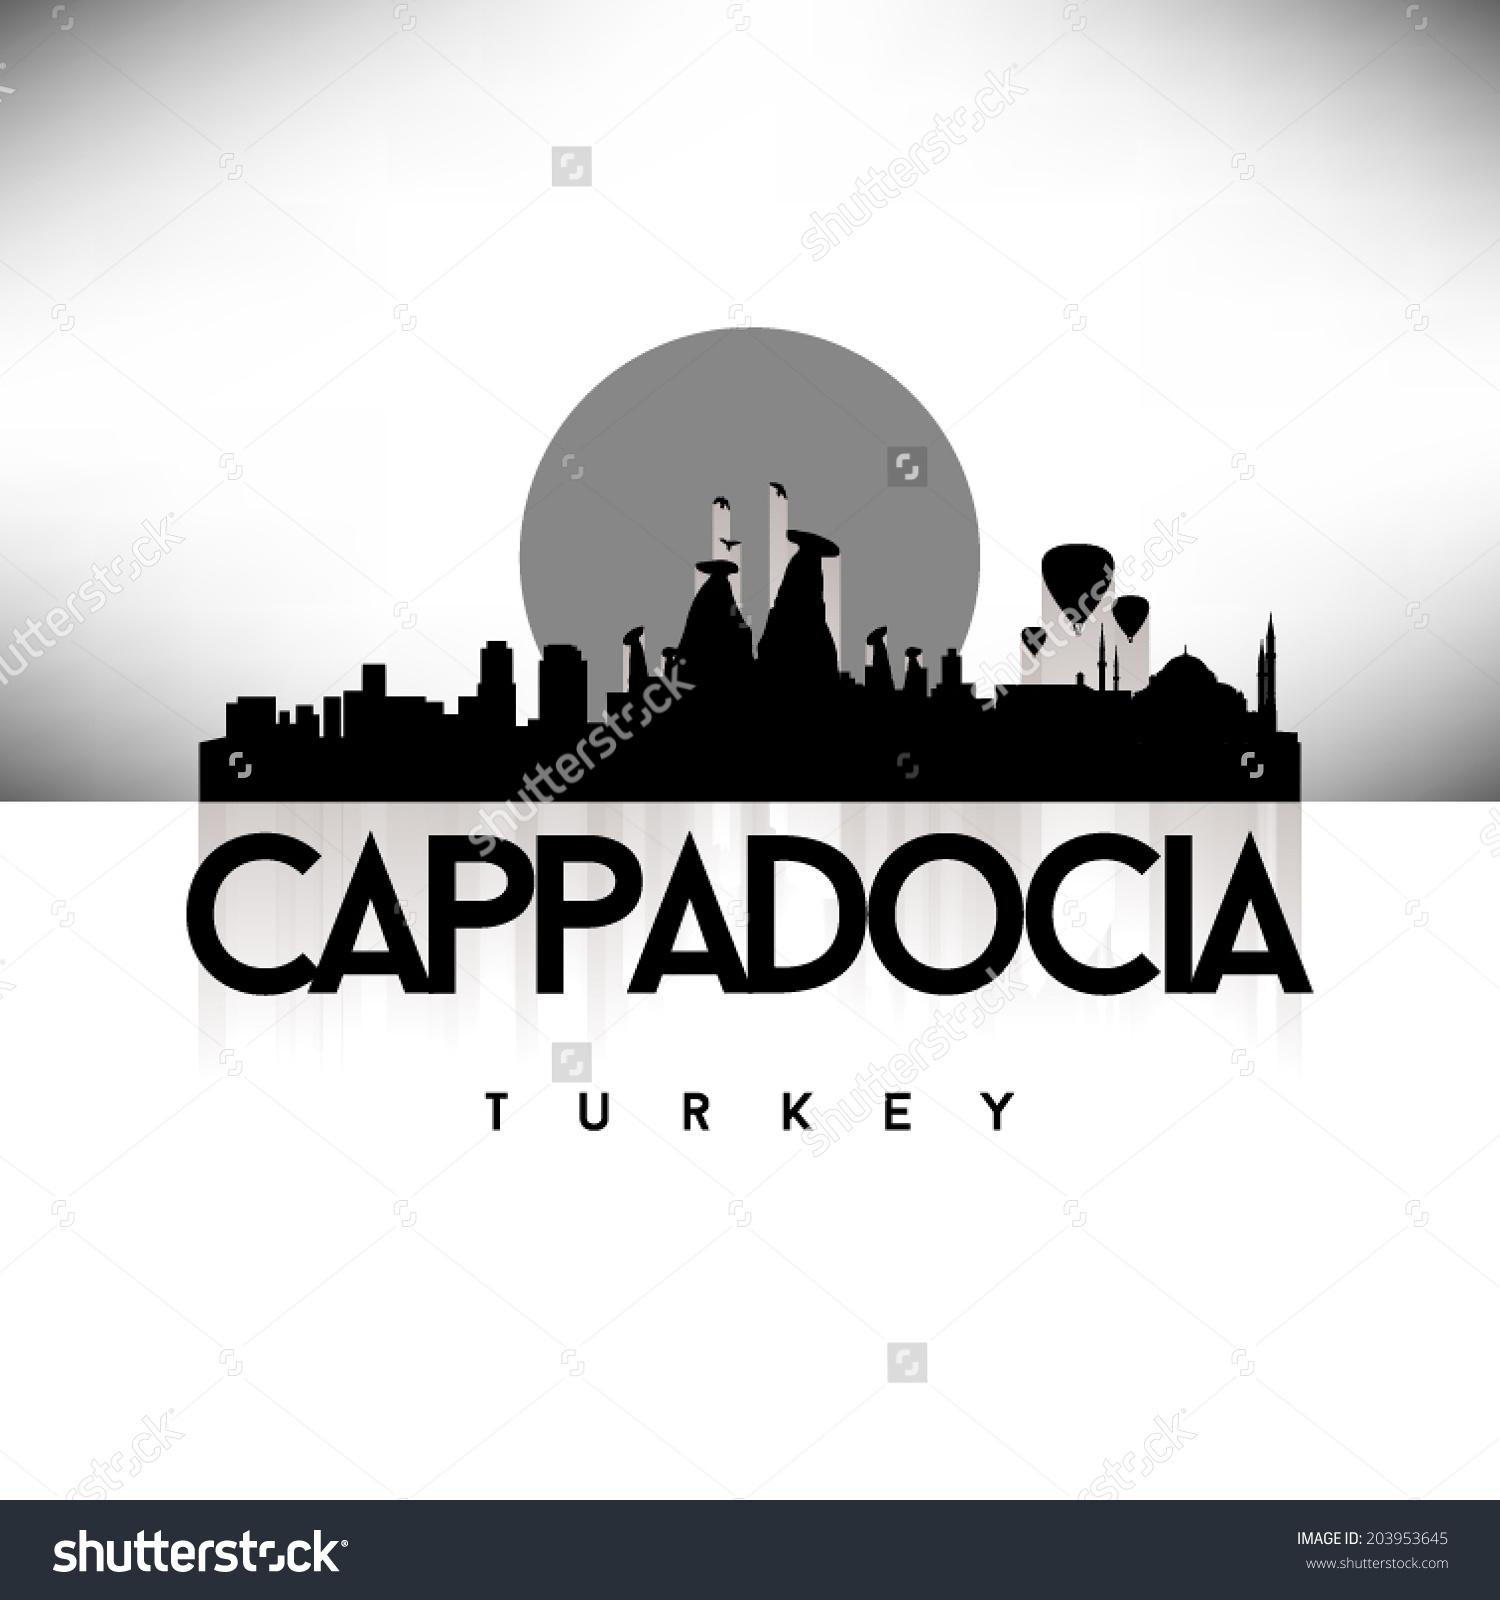 Cappadocia clipart #4, Download drawings